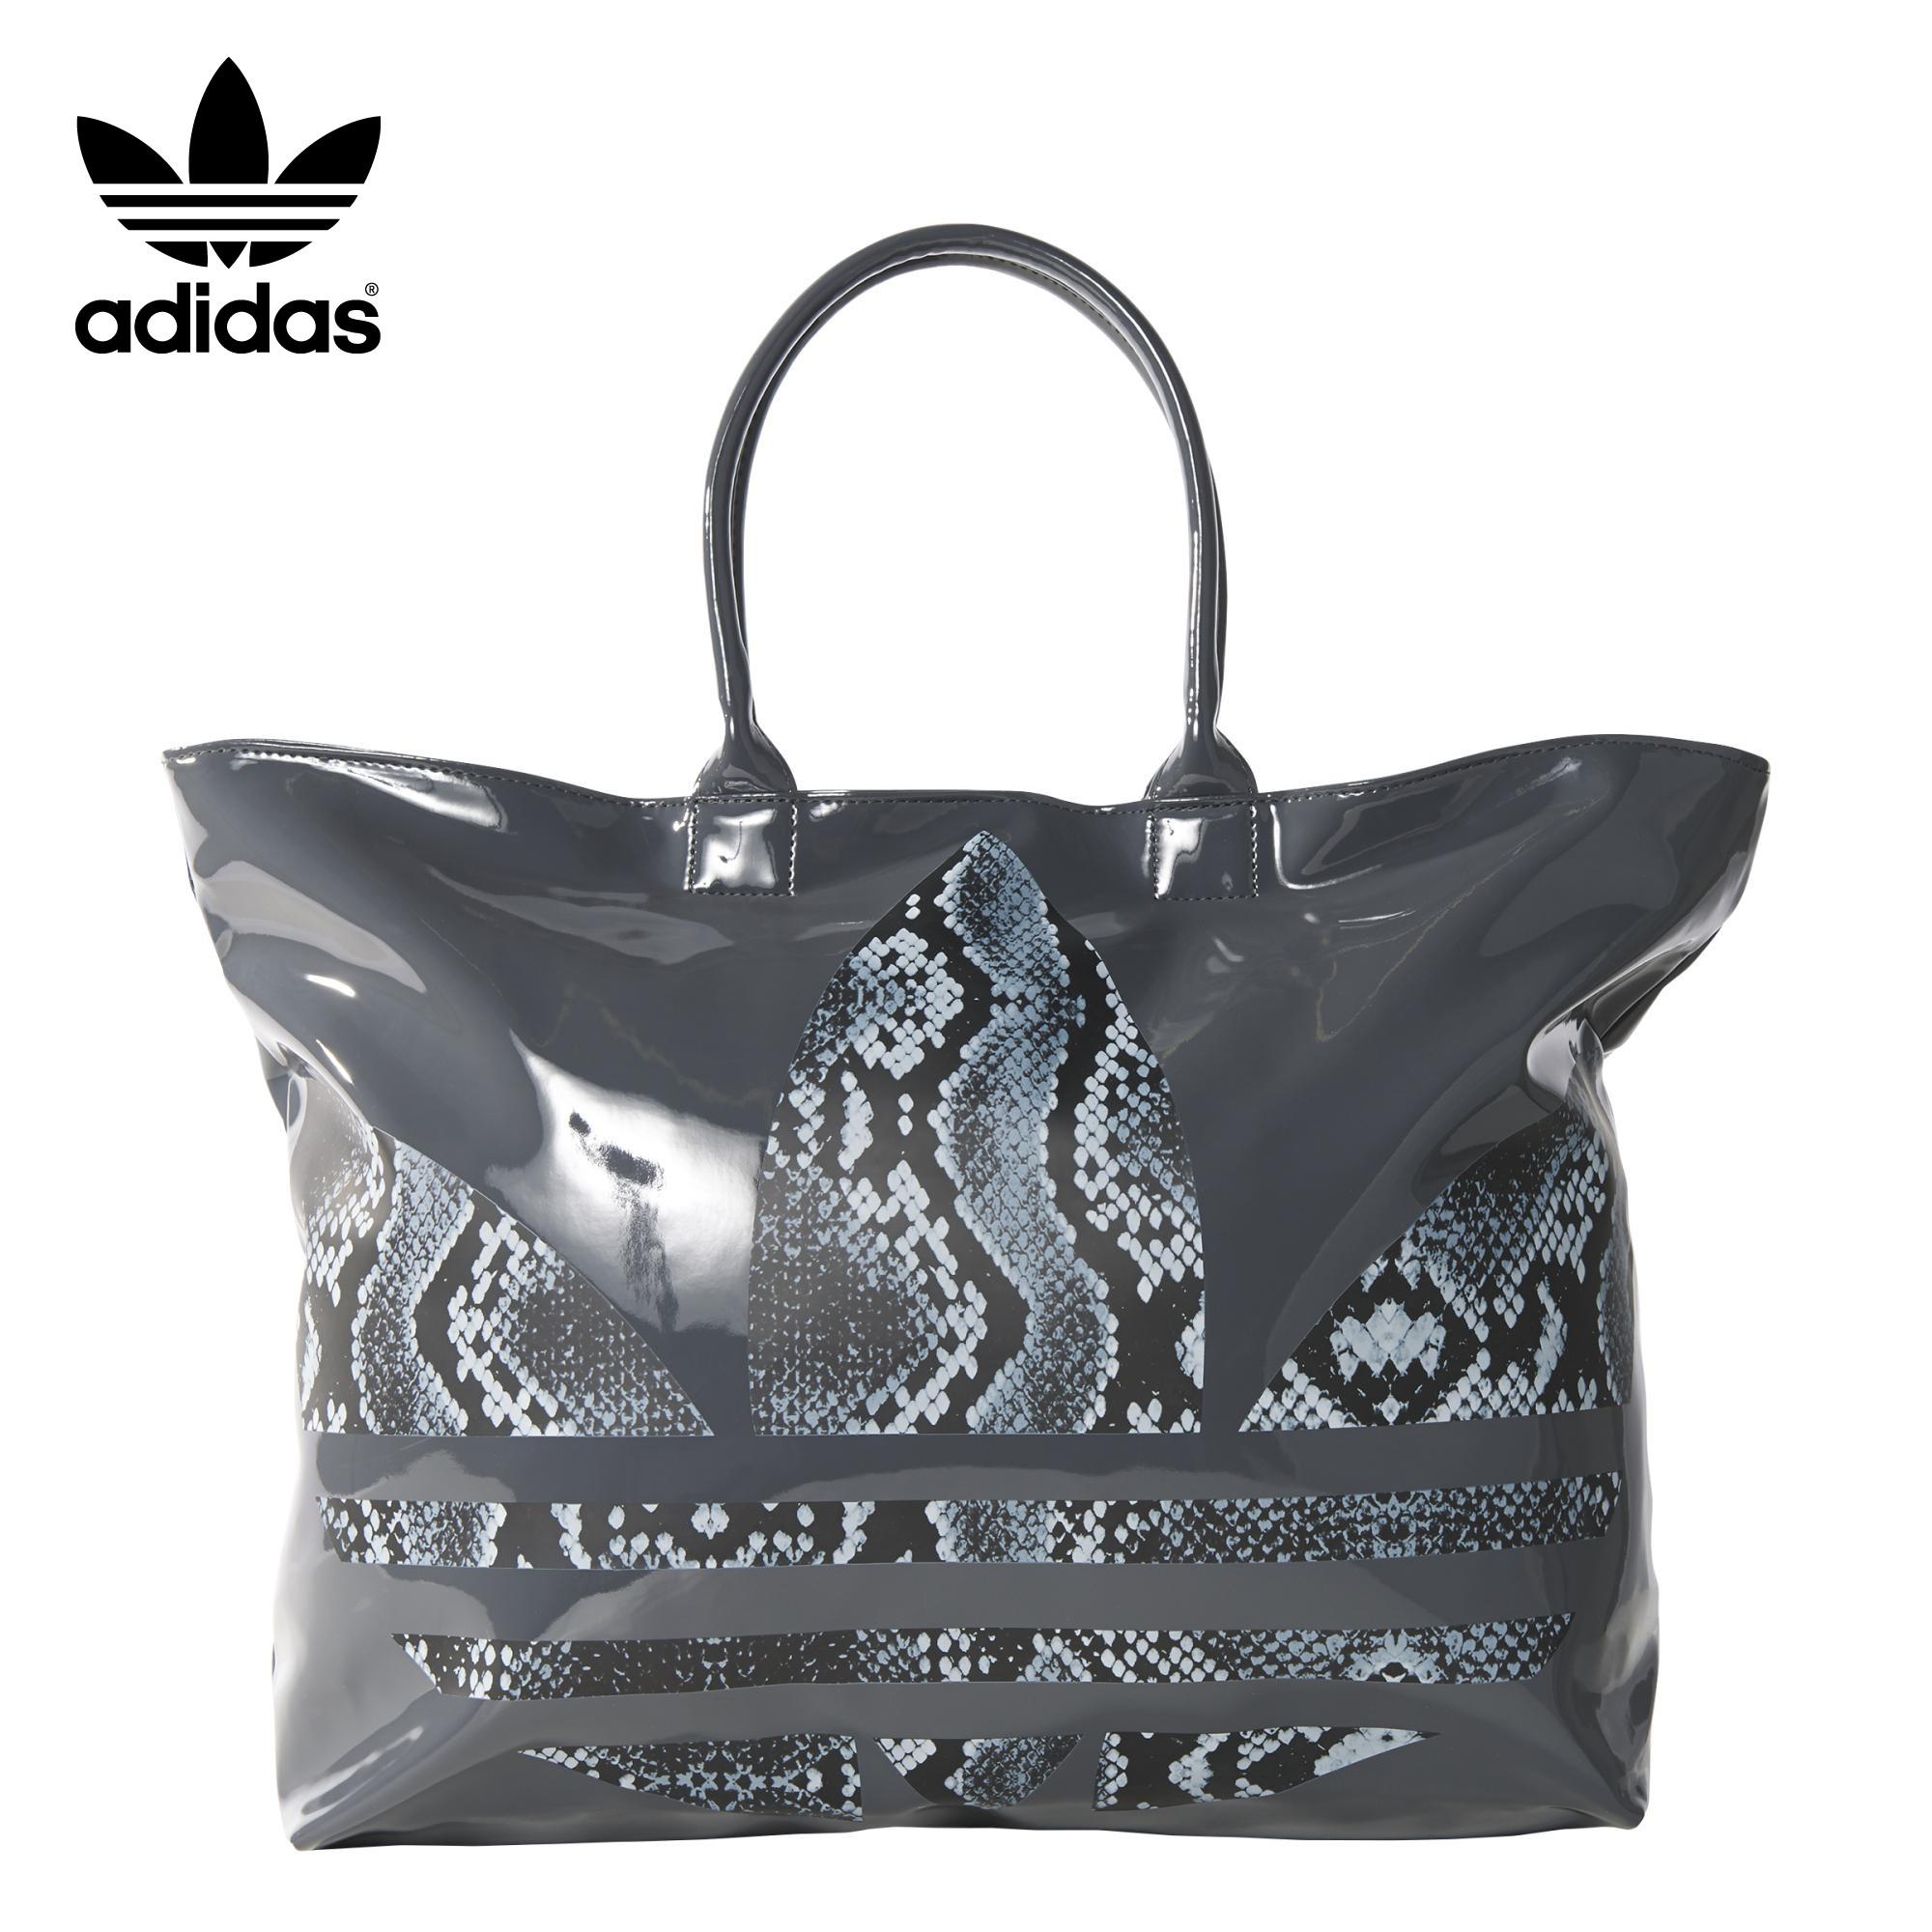 Shopper Bolso Adidas Mujer Ab2752 Snake Beach kwOPXuTZi